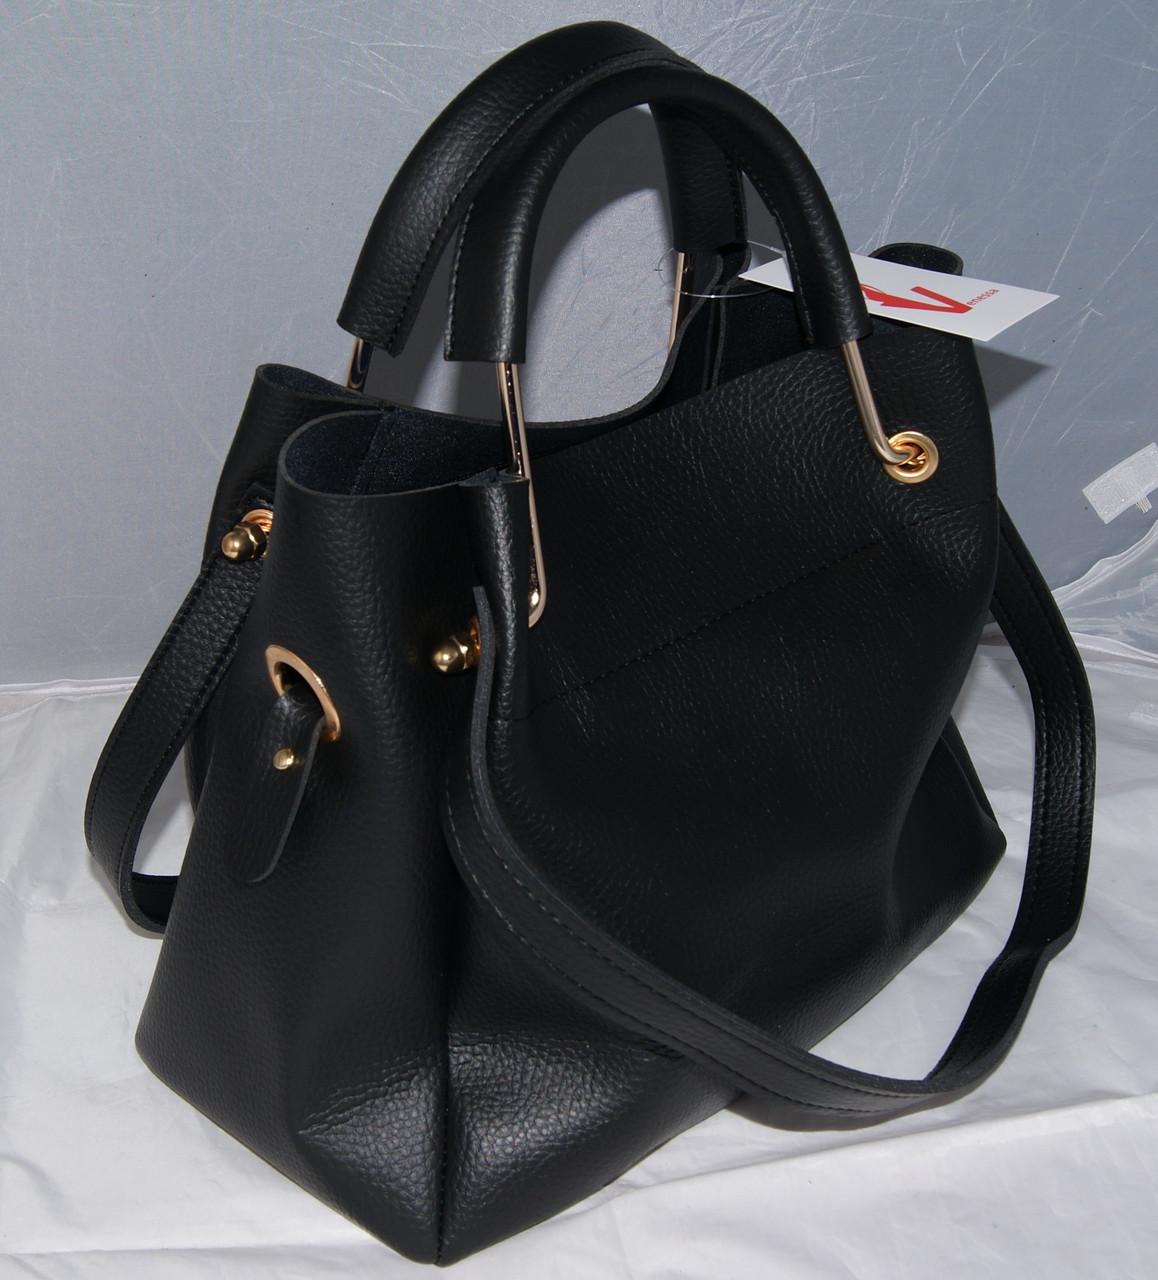 b88d00cf2a7f ... Женская черная mini сумка-шоппер Michael Kors (Майкл Корс) с  отстёгивающейся косметичкой, ...